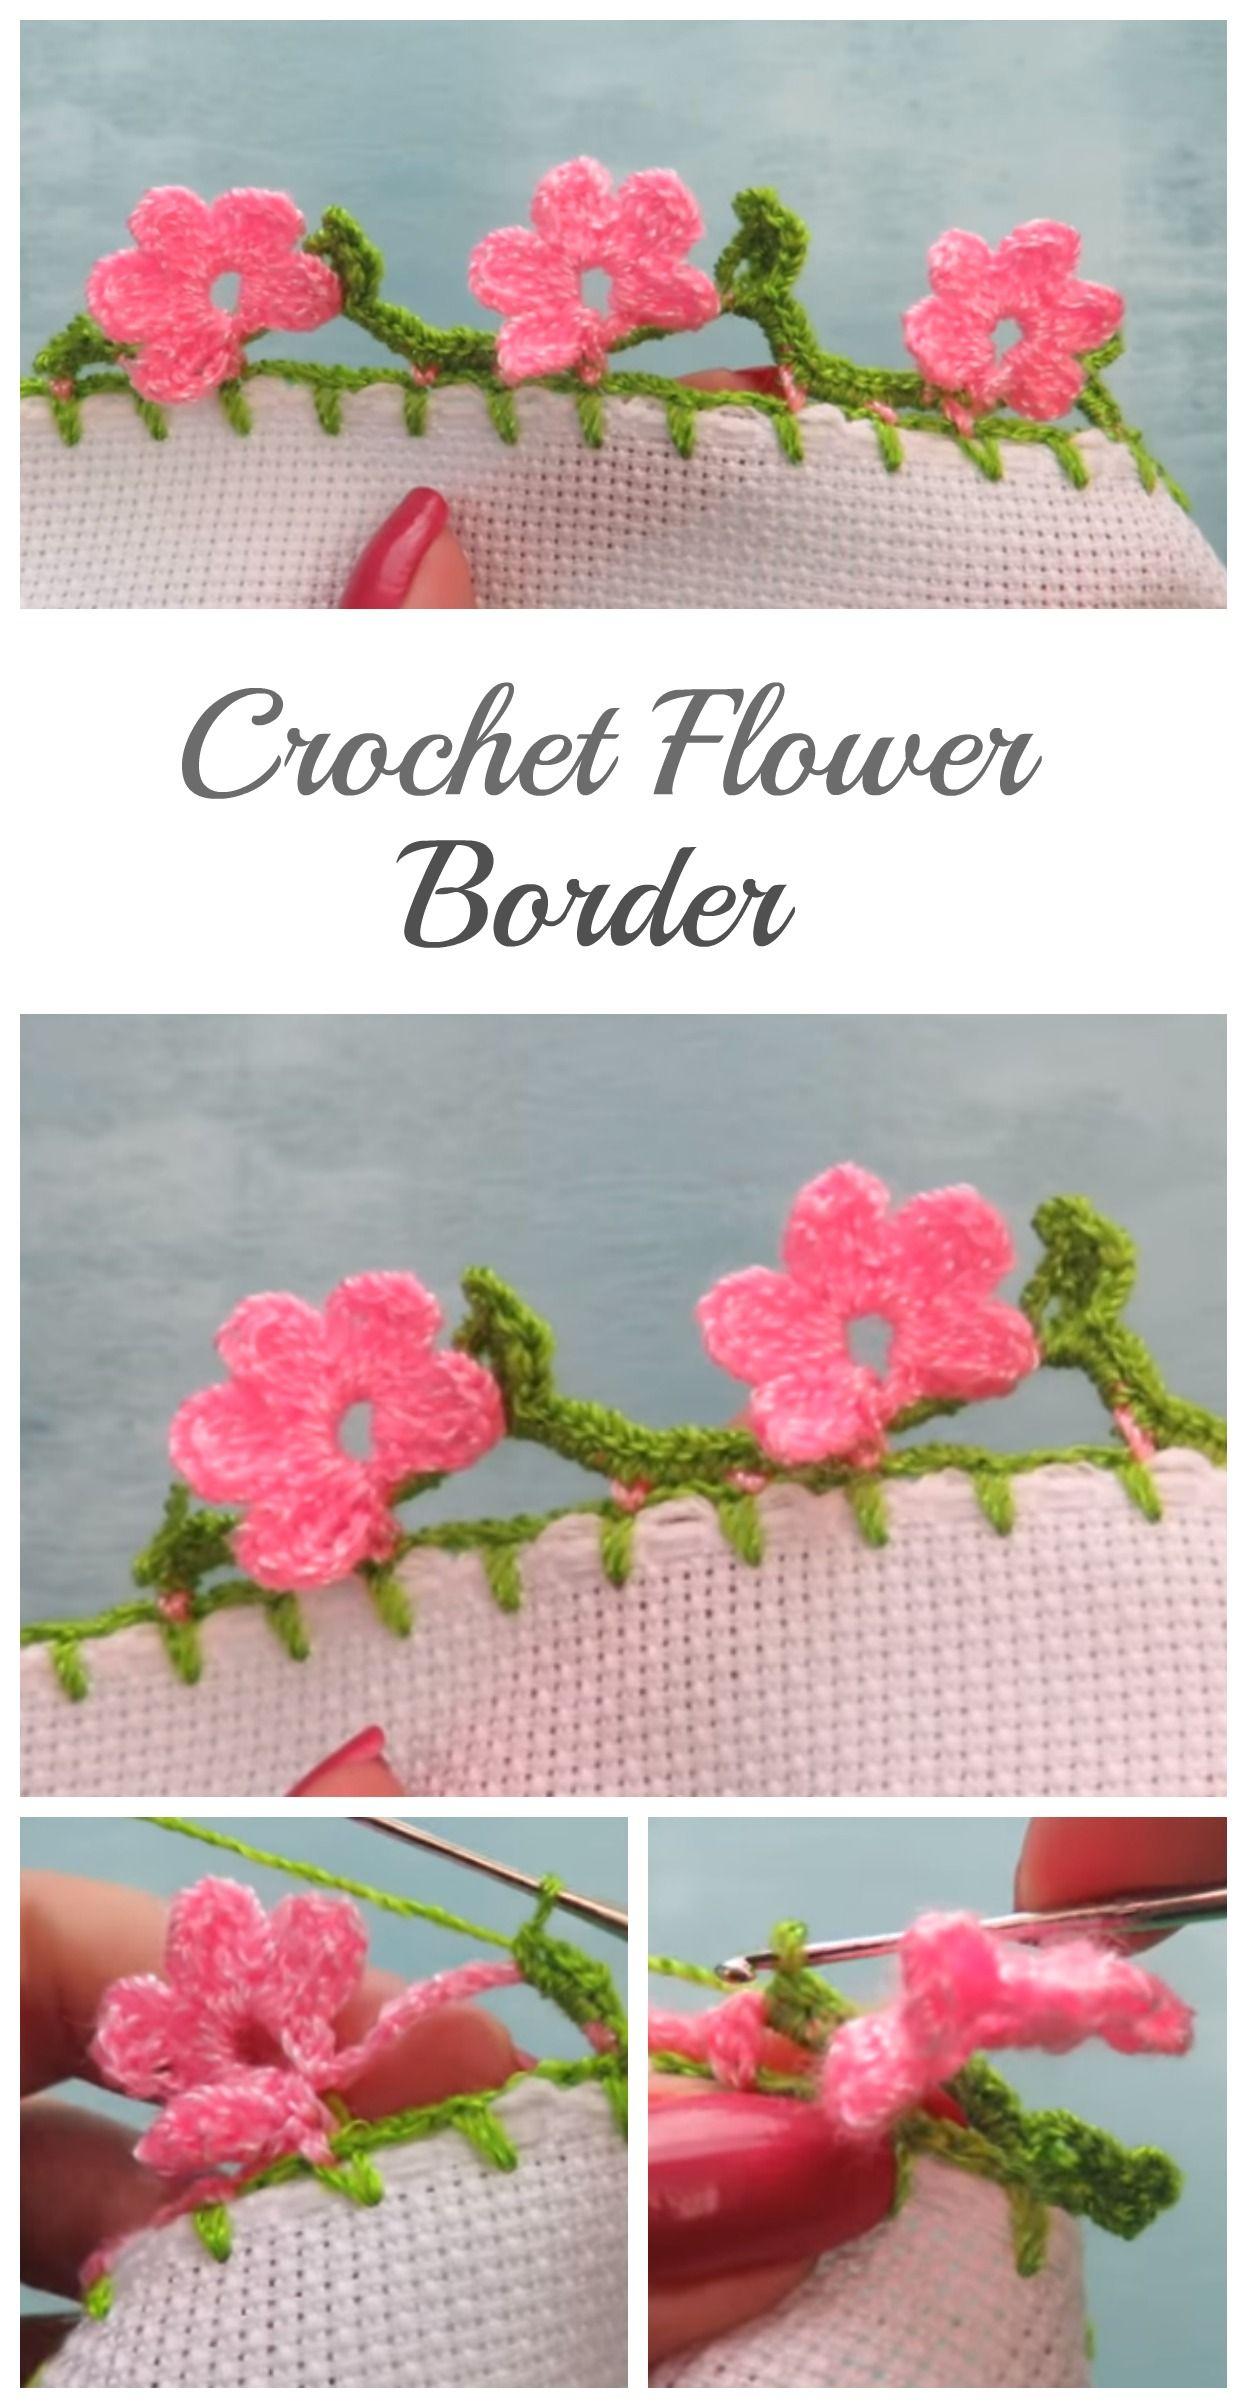 Crochet Beautiful Flower Border Crochetflowers Crochetedging